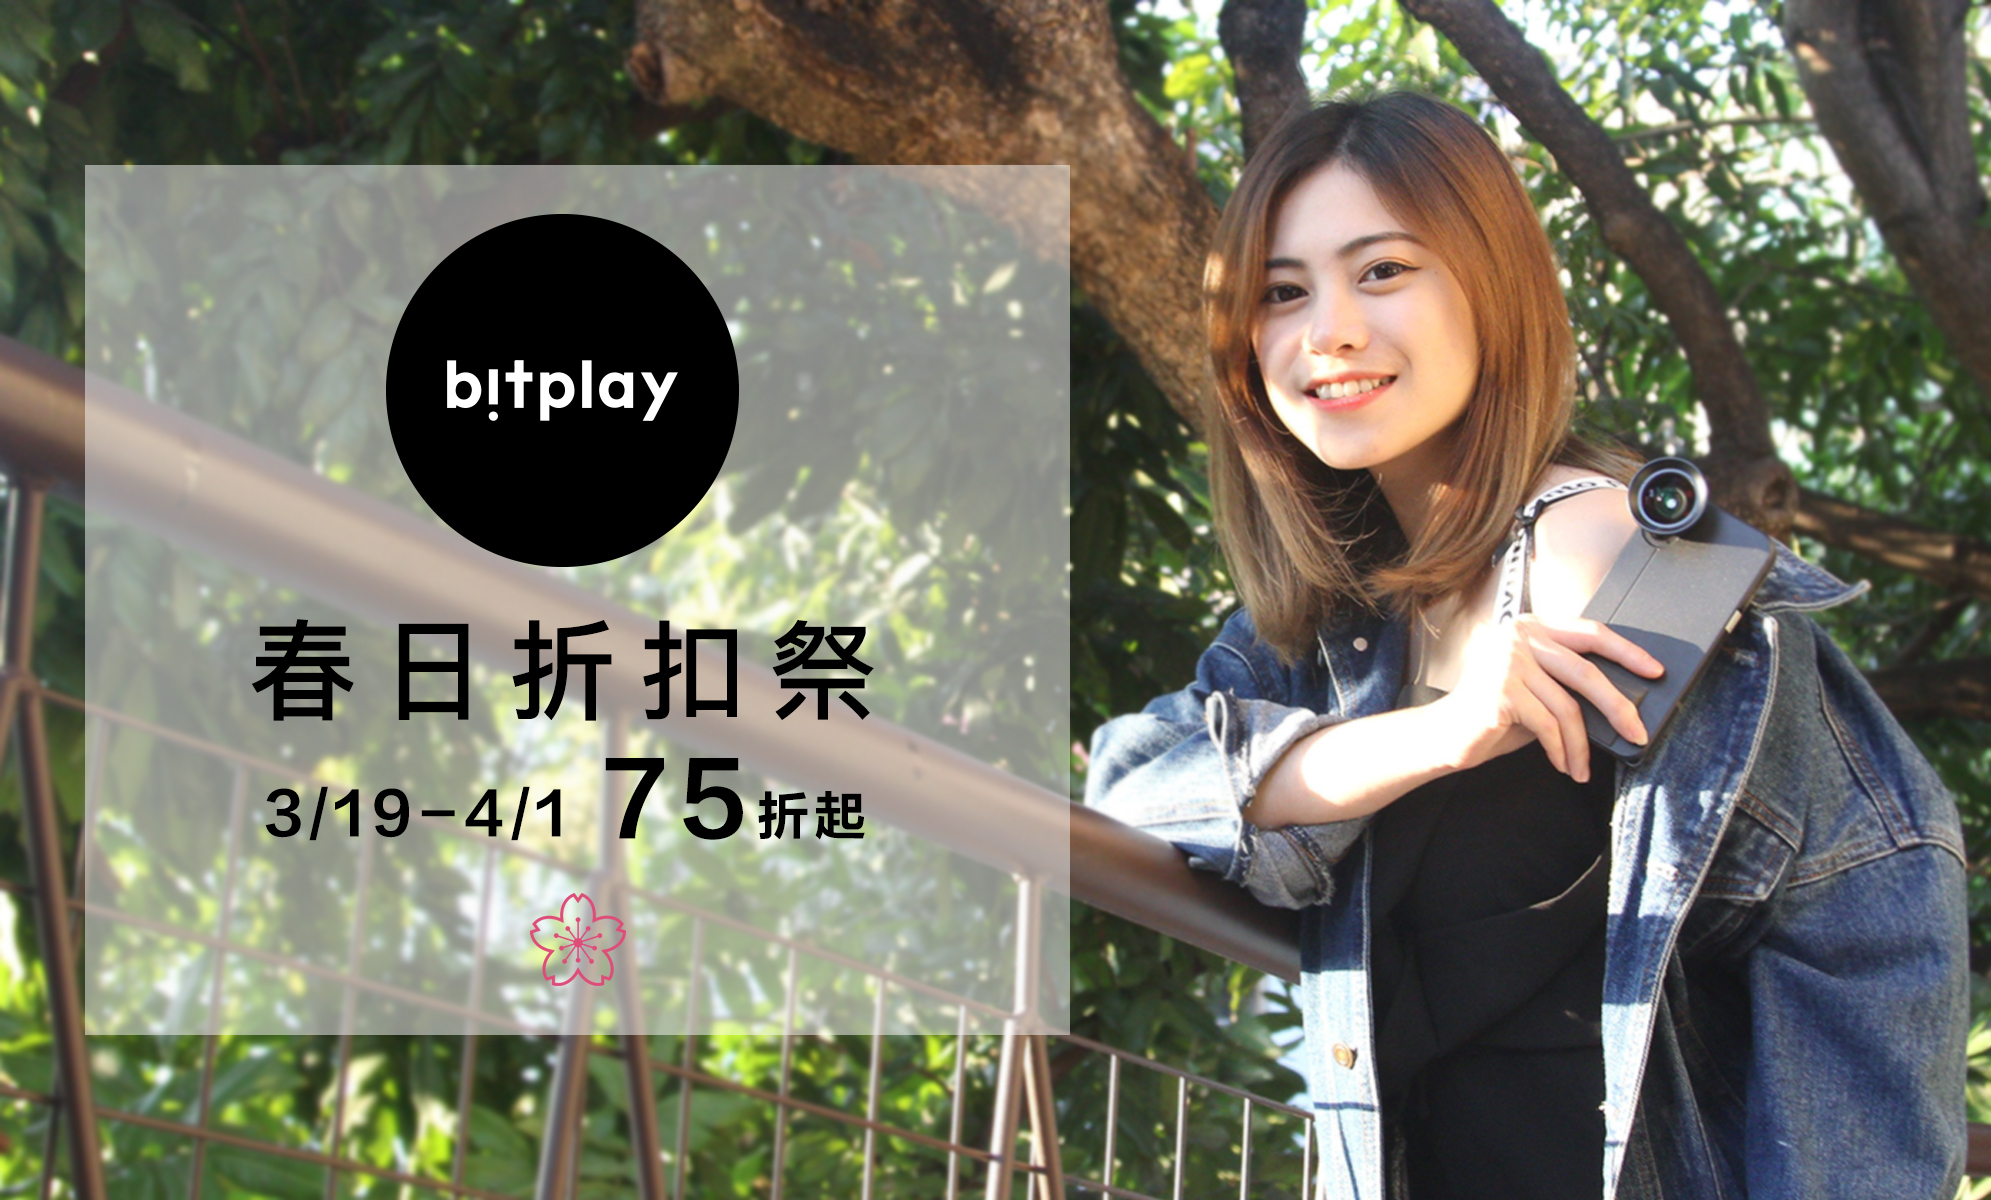 bitplay 春季折扣 鏡頭 手機殼 攝影師